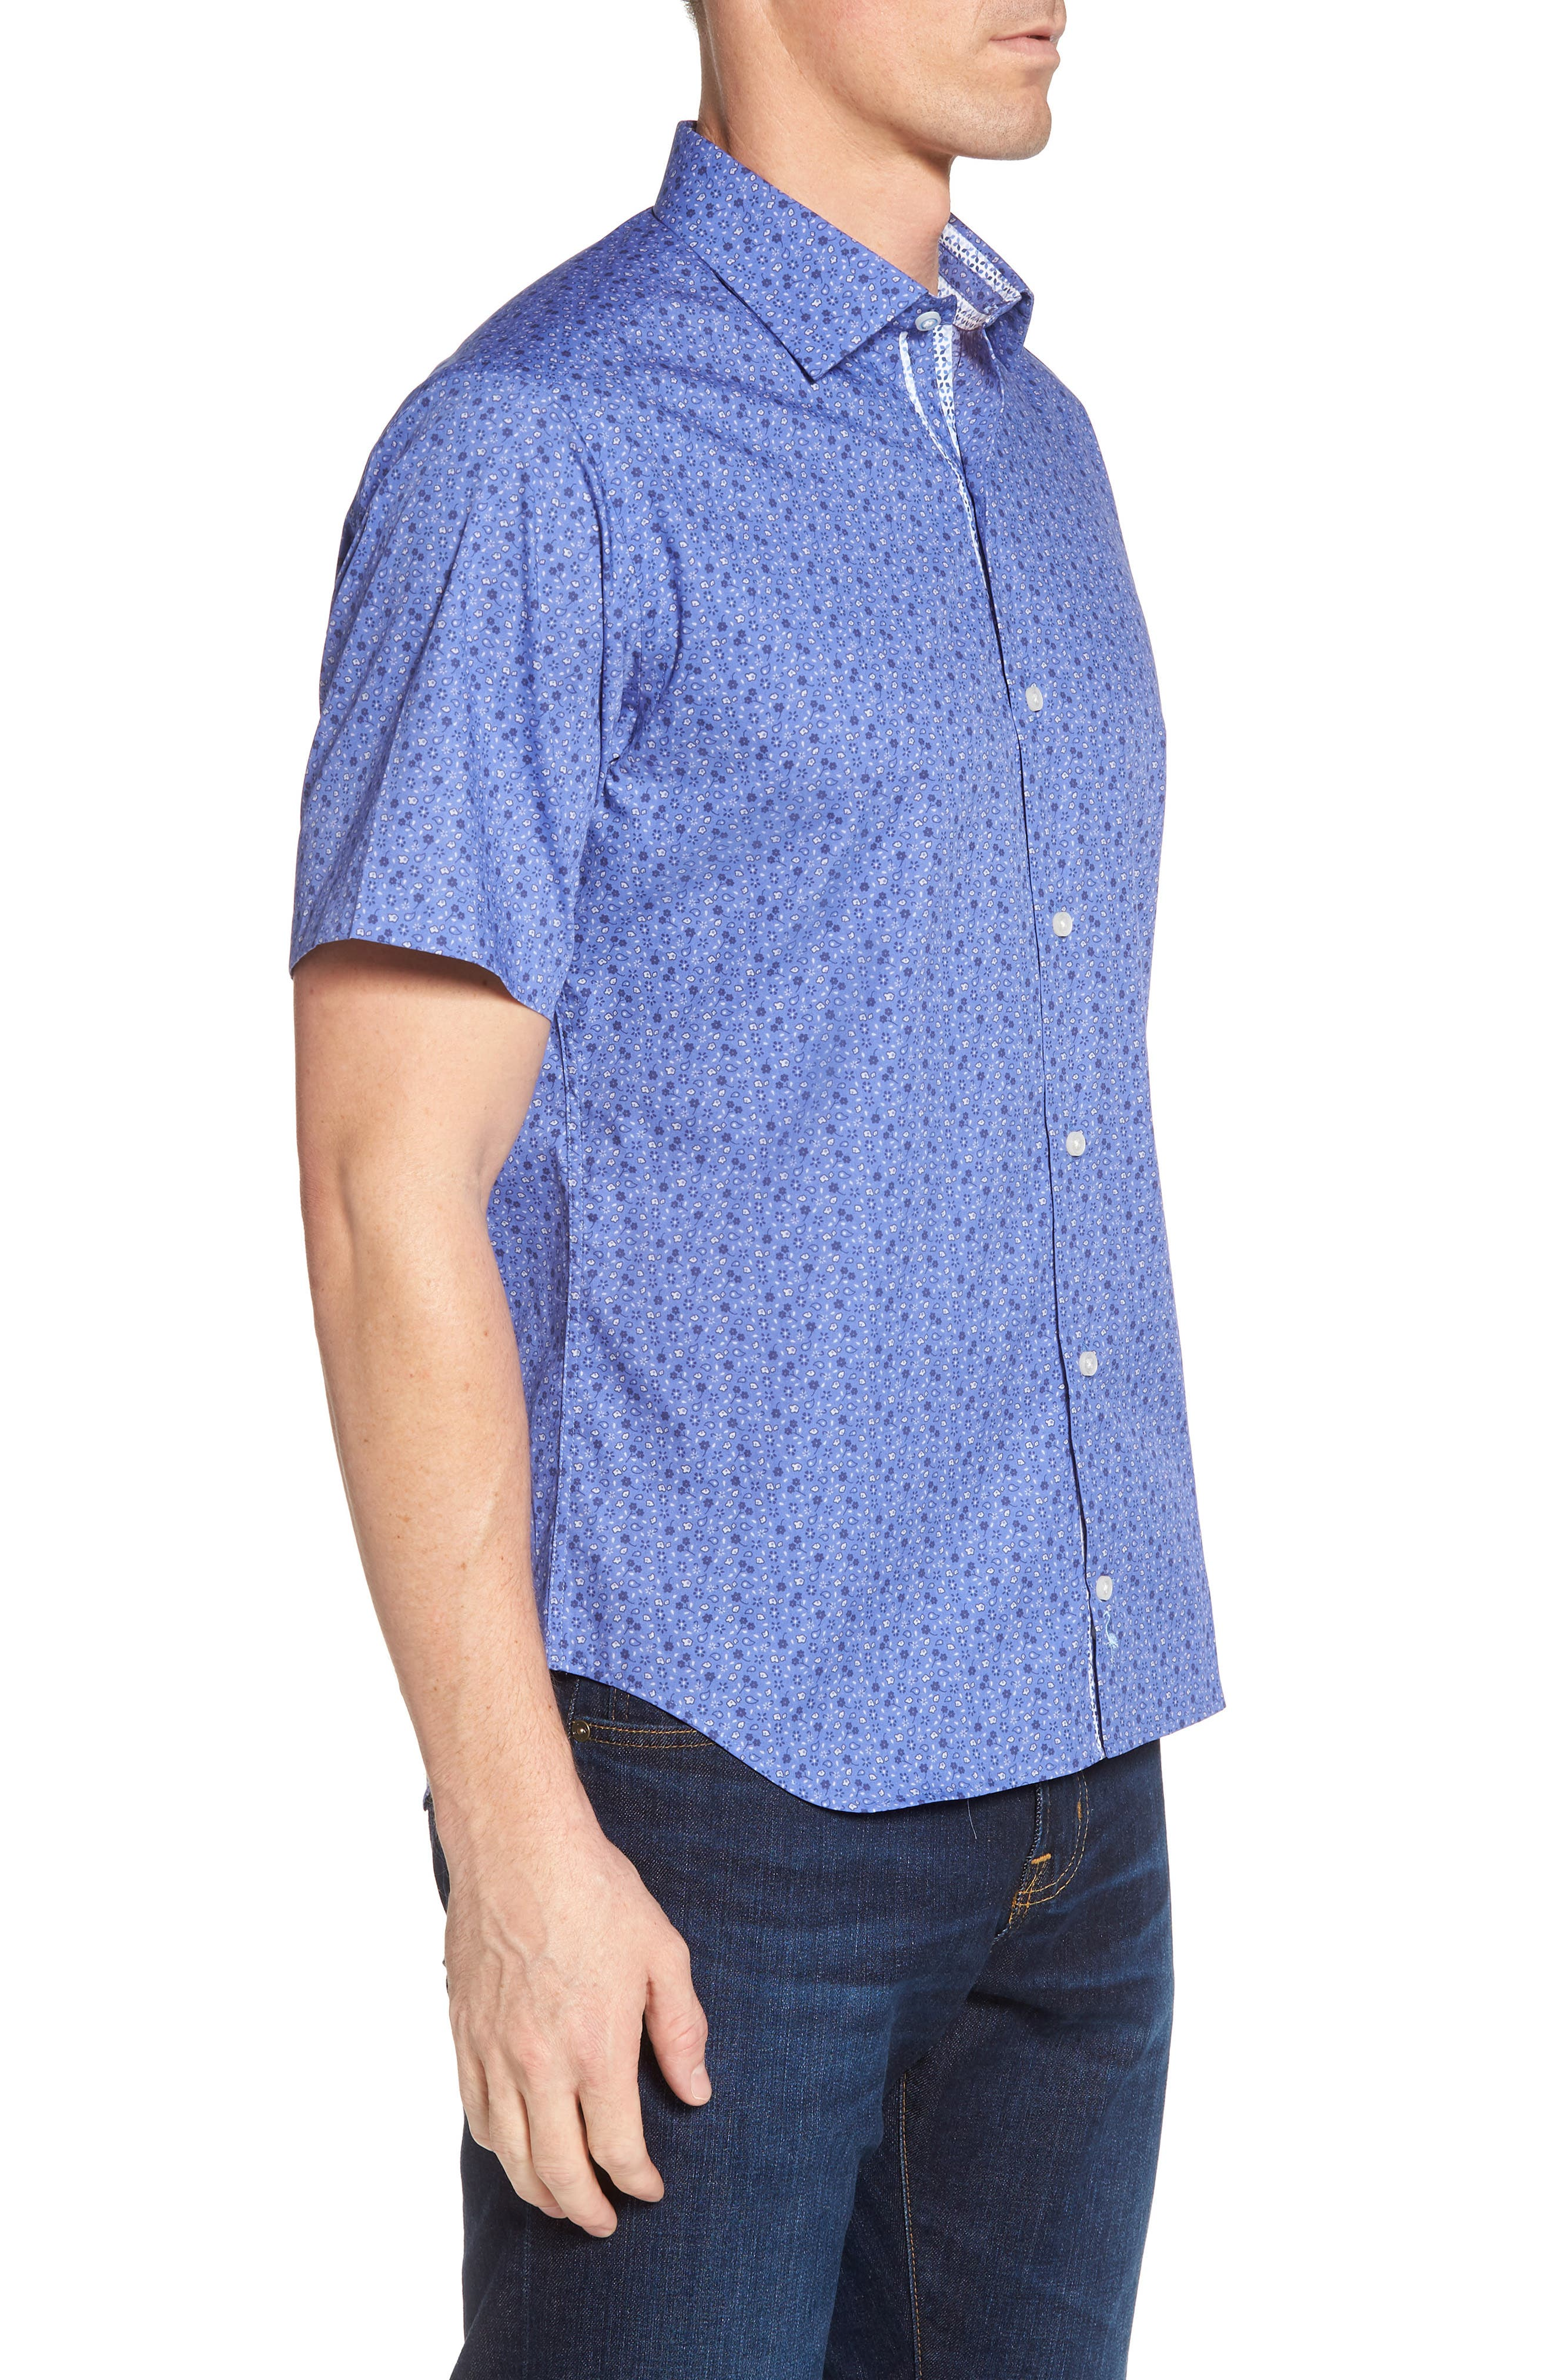 Ballou Regular Fit Floral Print Sport Shirt,                             Alternate thumbnail 3, color,                             430